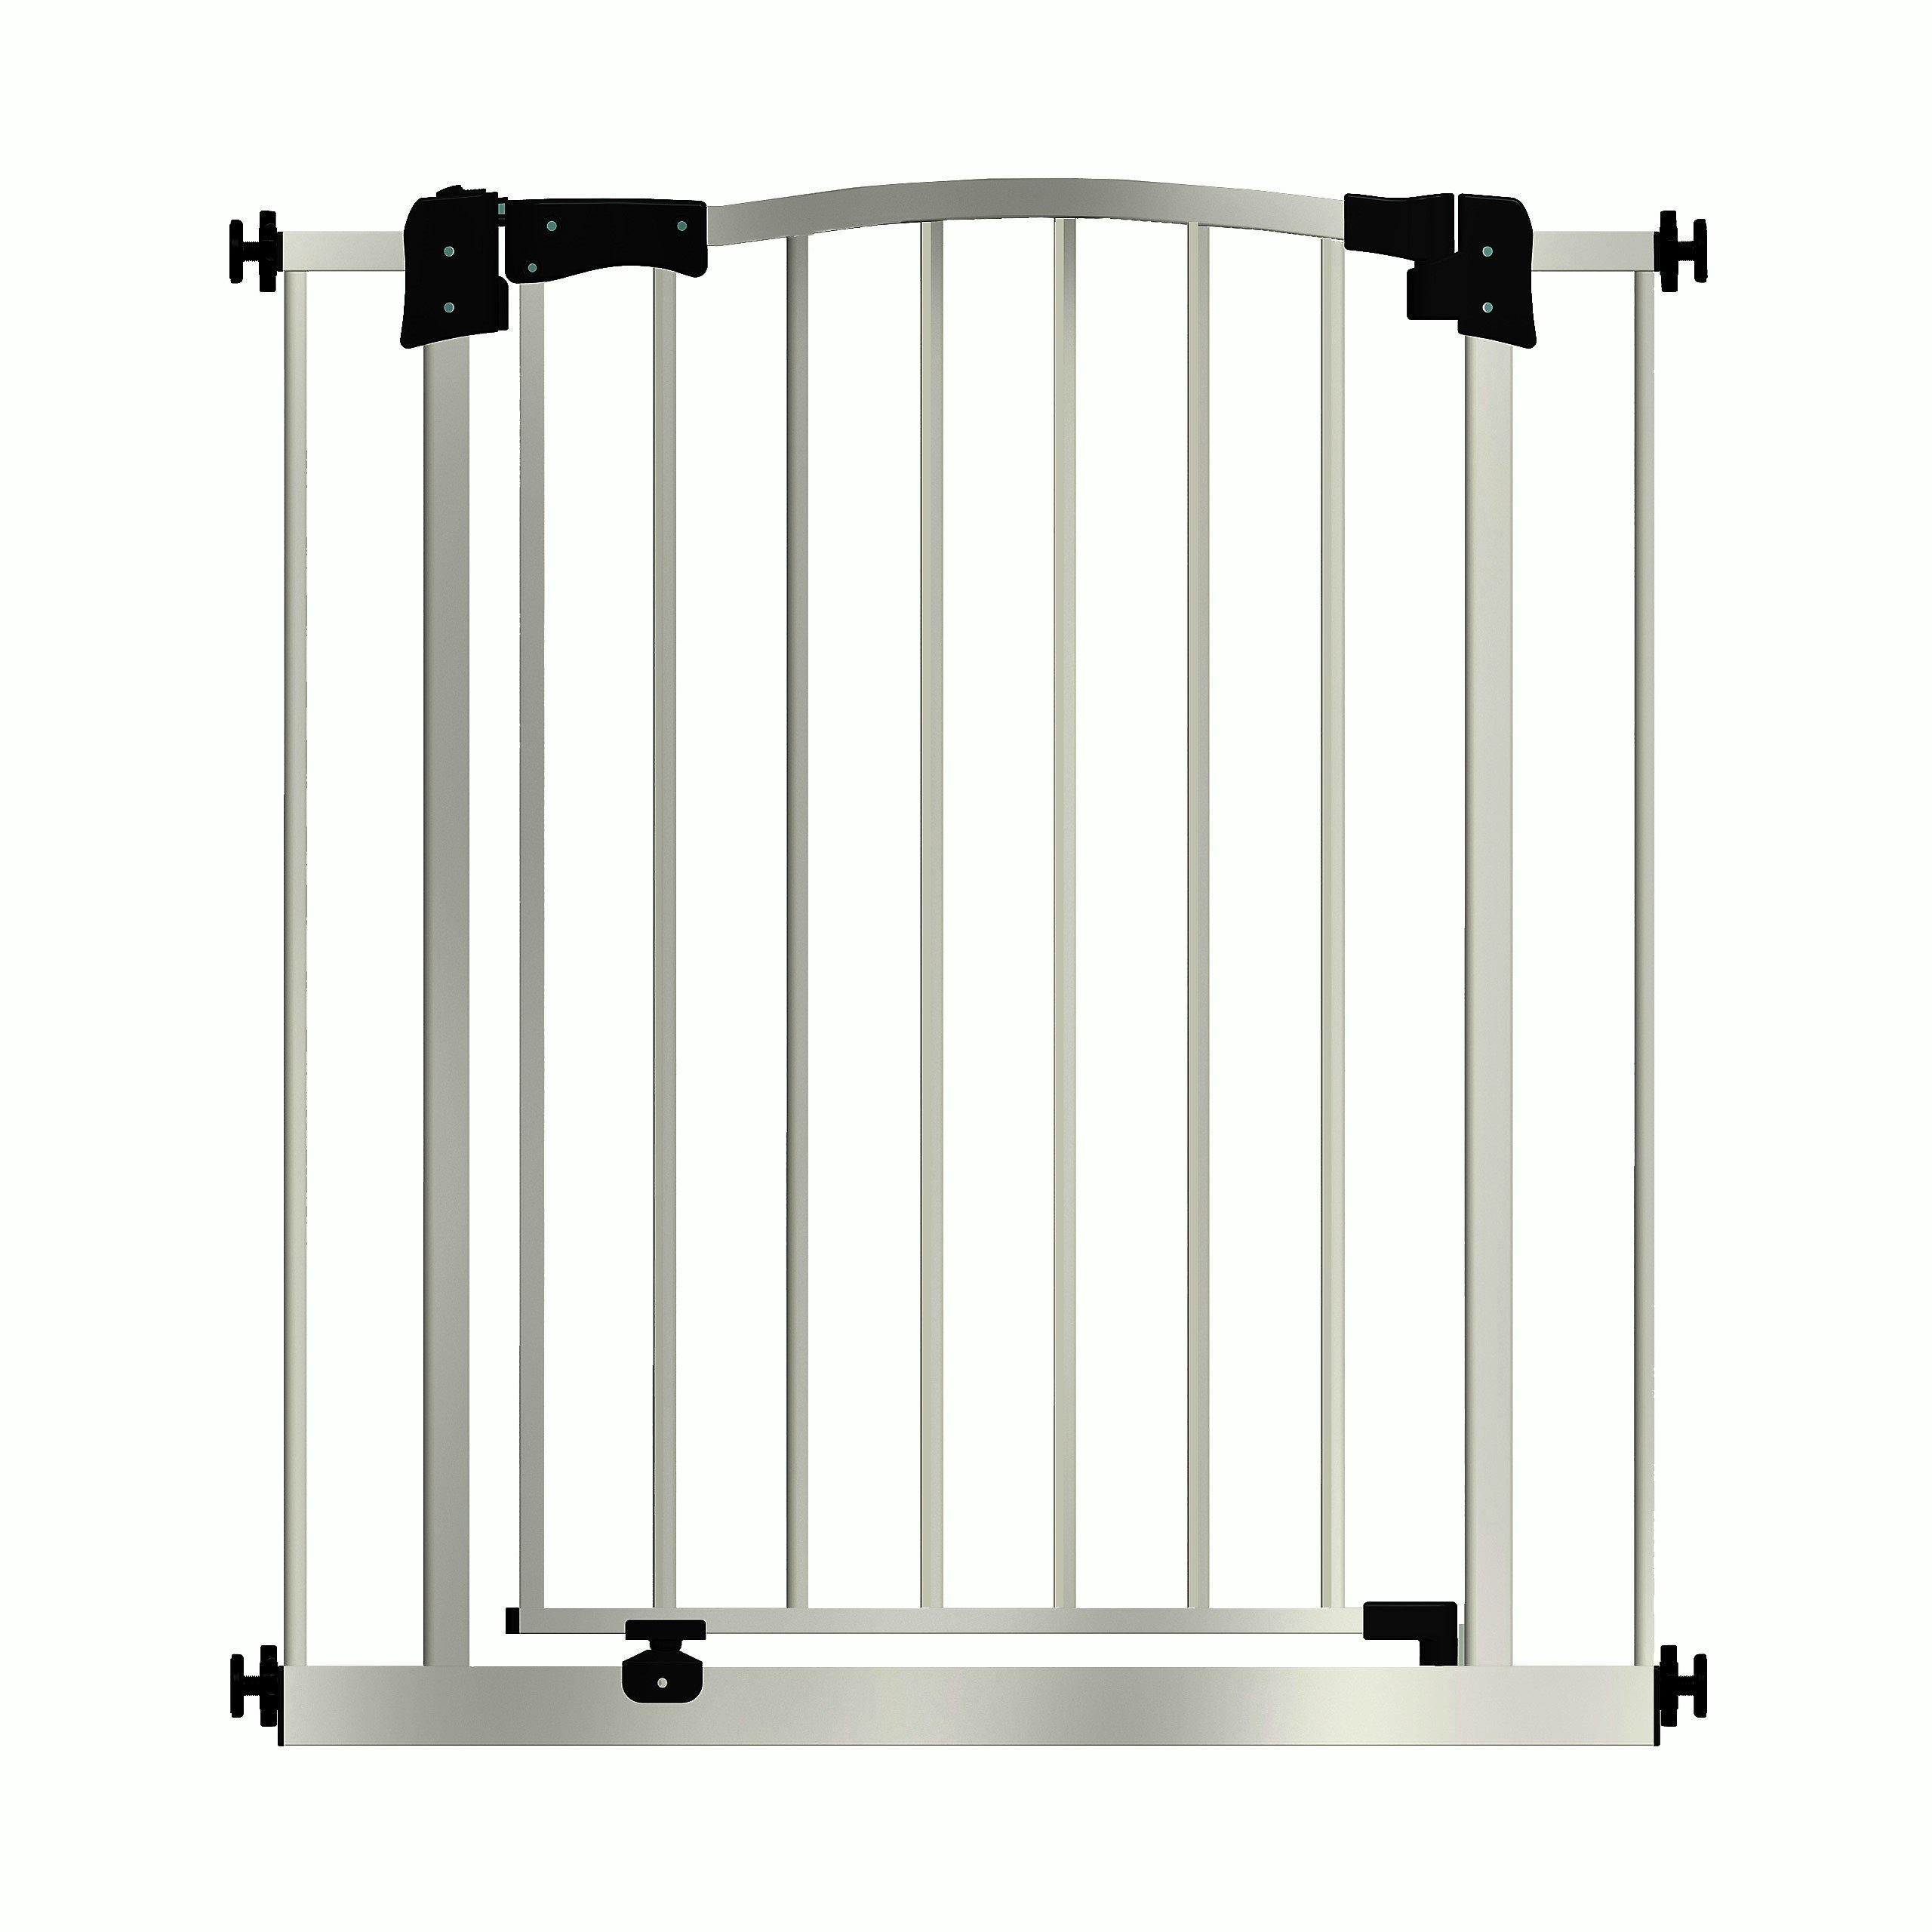 Item INVISIBLE METAL DOOR STAIRS 73-92cm MAXIGATE